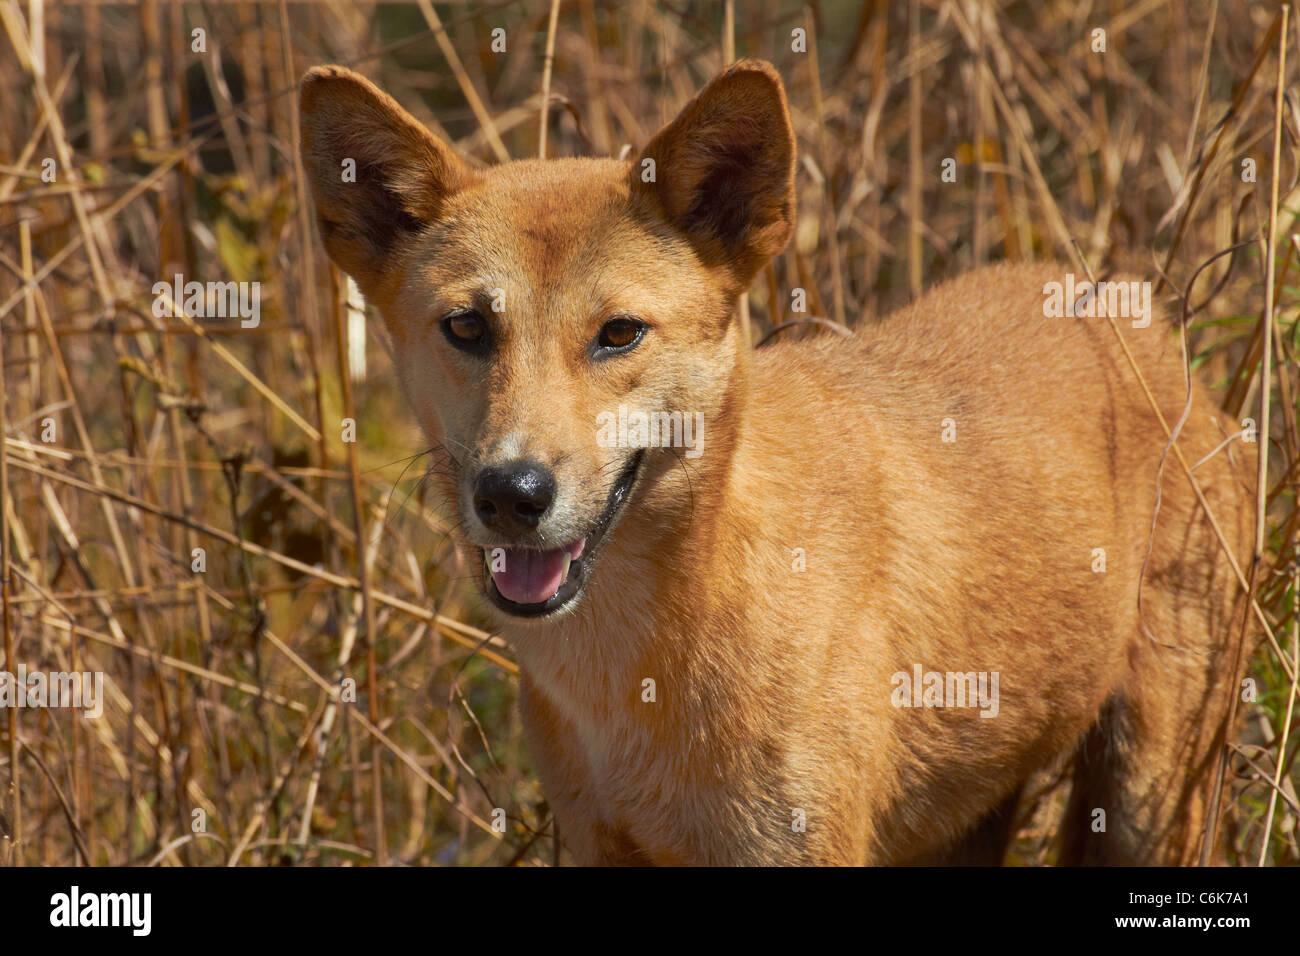 Dingo (Canis lupus dingo), Kakadu National Park, Northern Territory, Australia - Stock Image